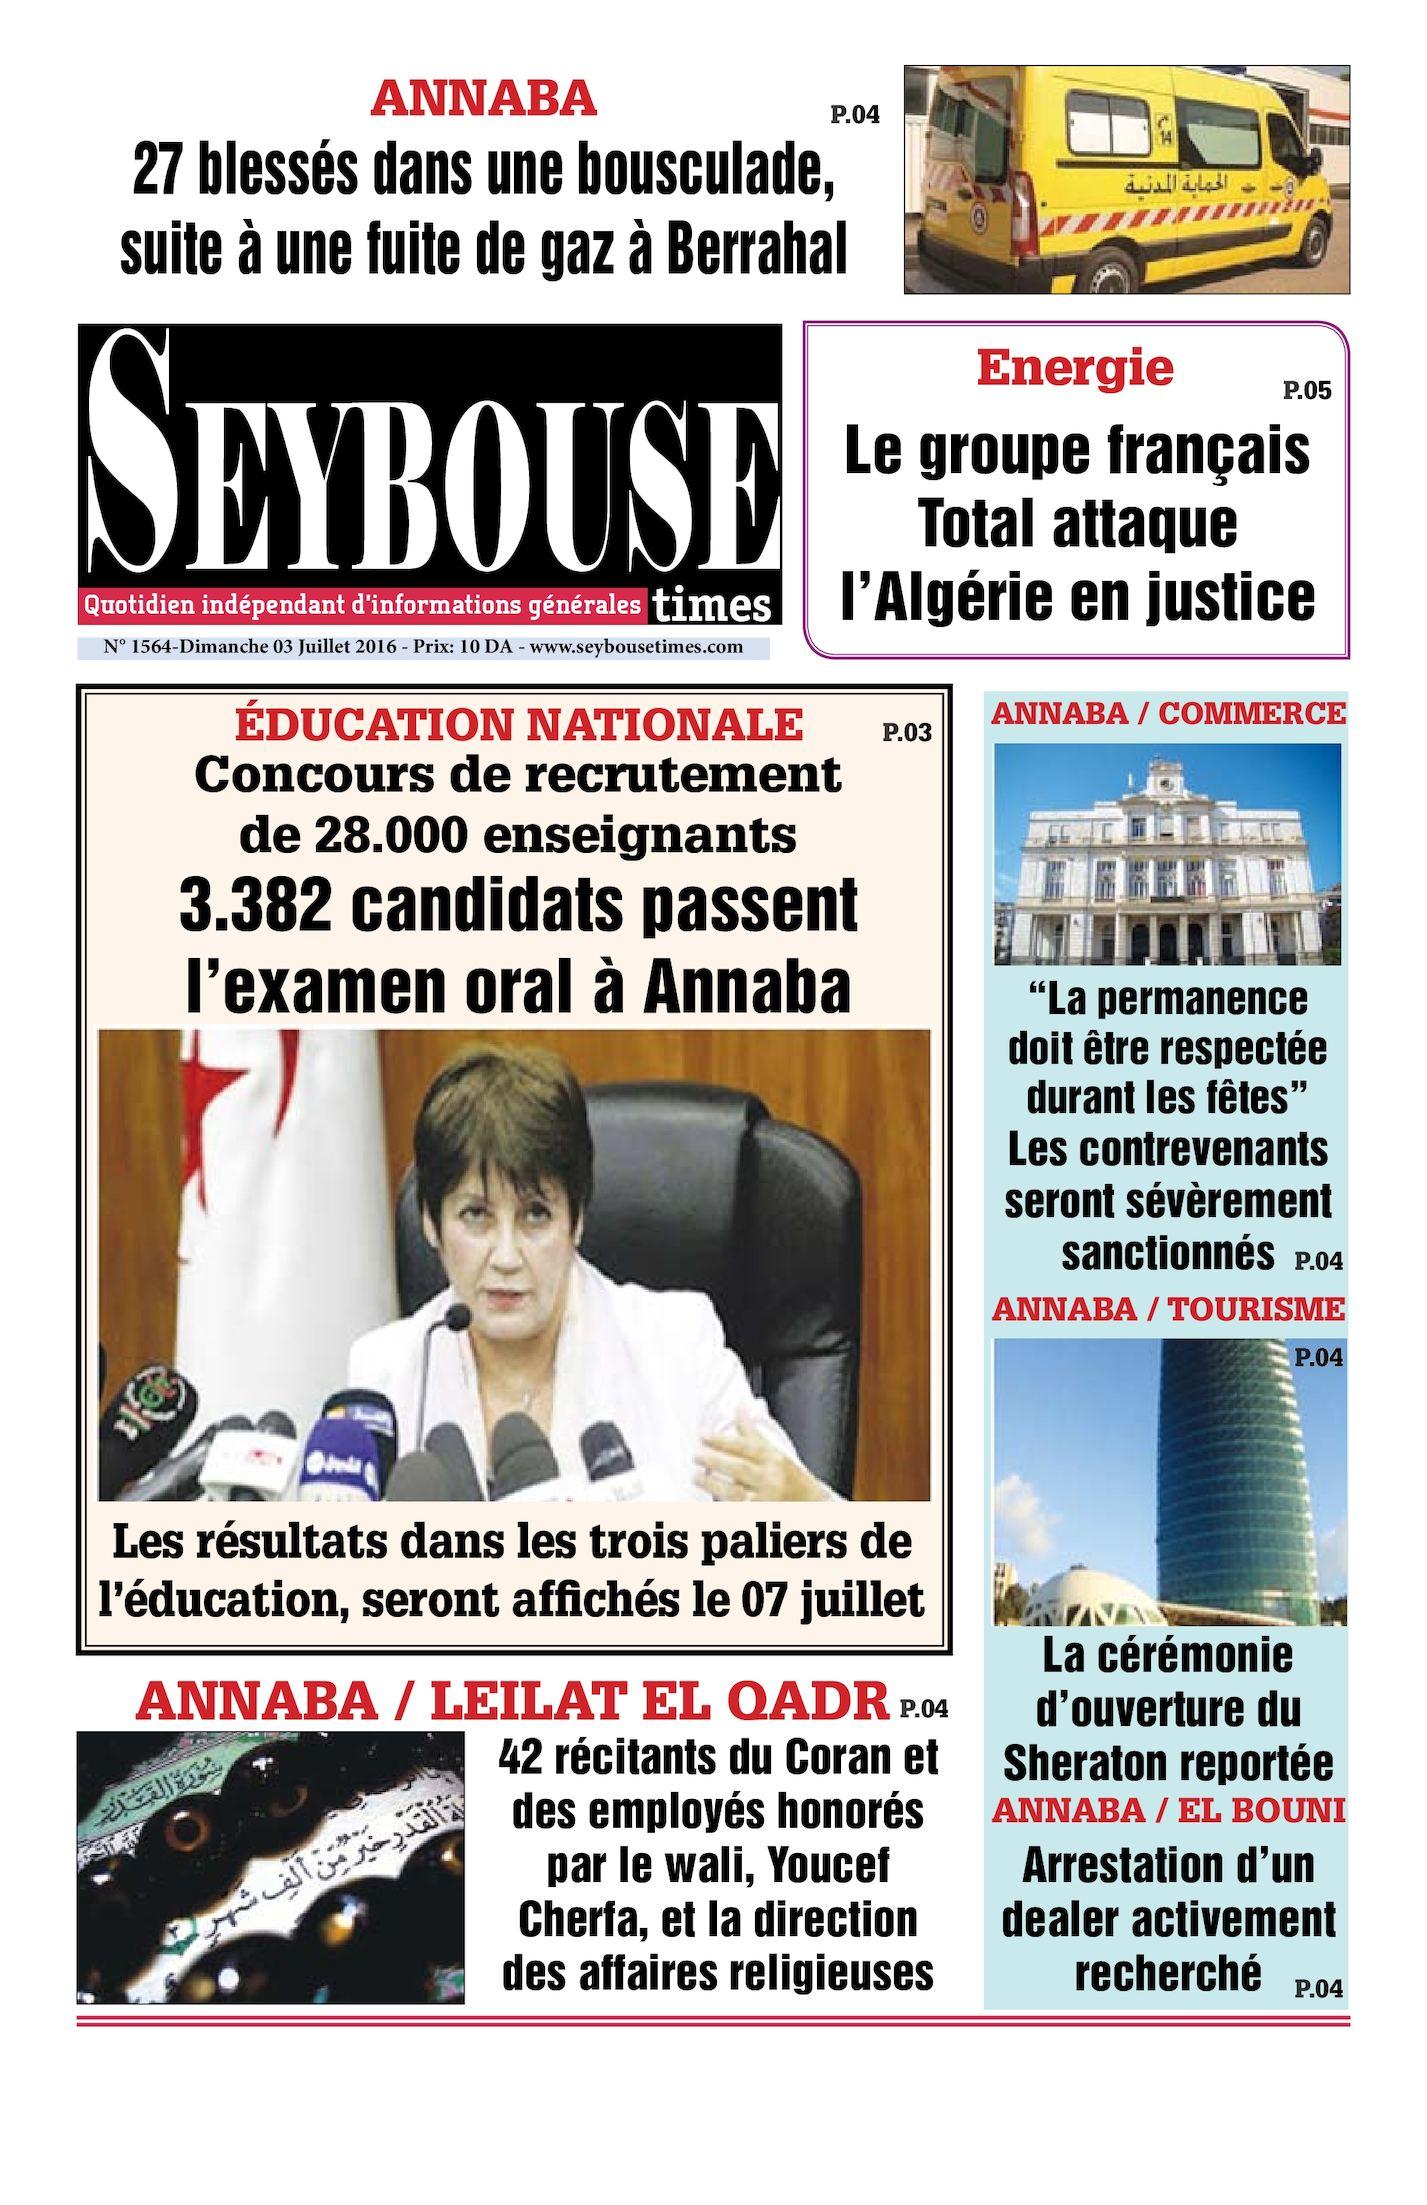 Calam o seybousetimes pdf e 1564 - Chambre nationale des huissiers de justice resultat examen ...